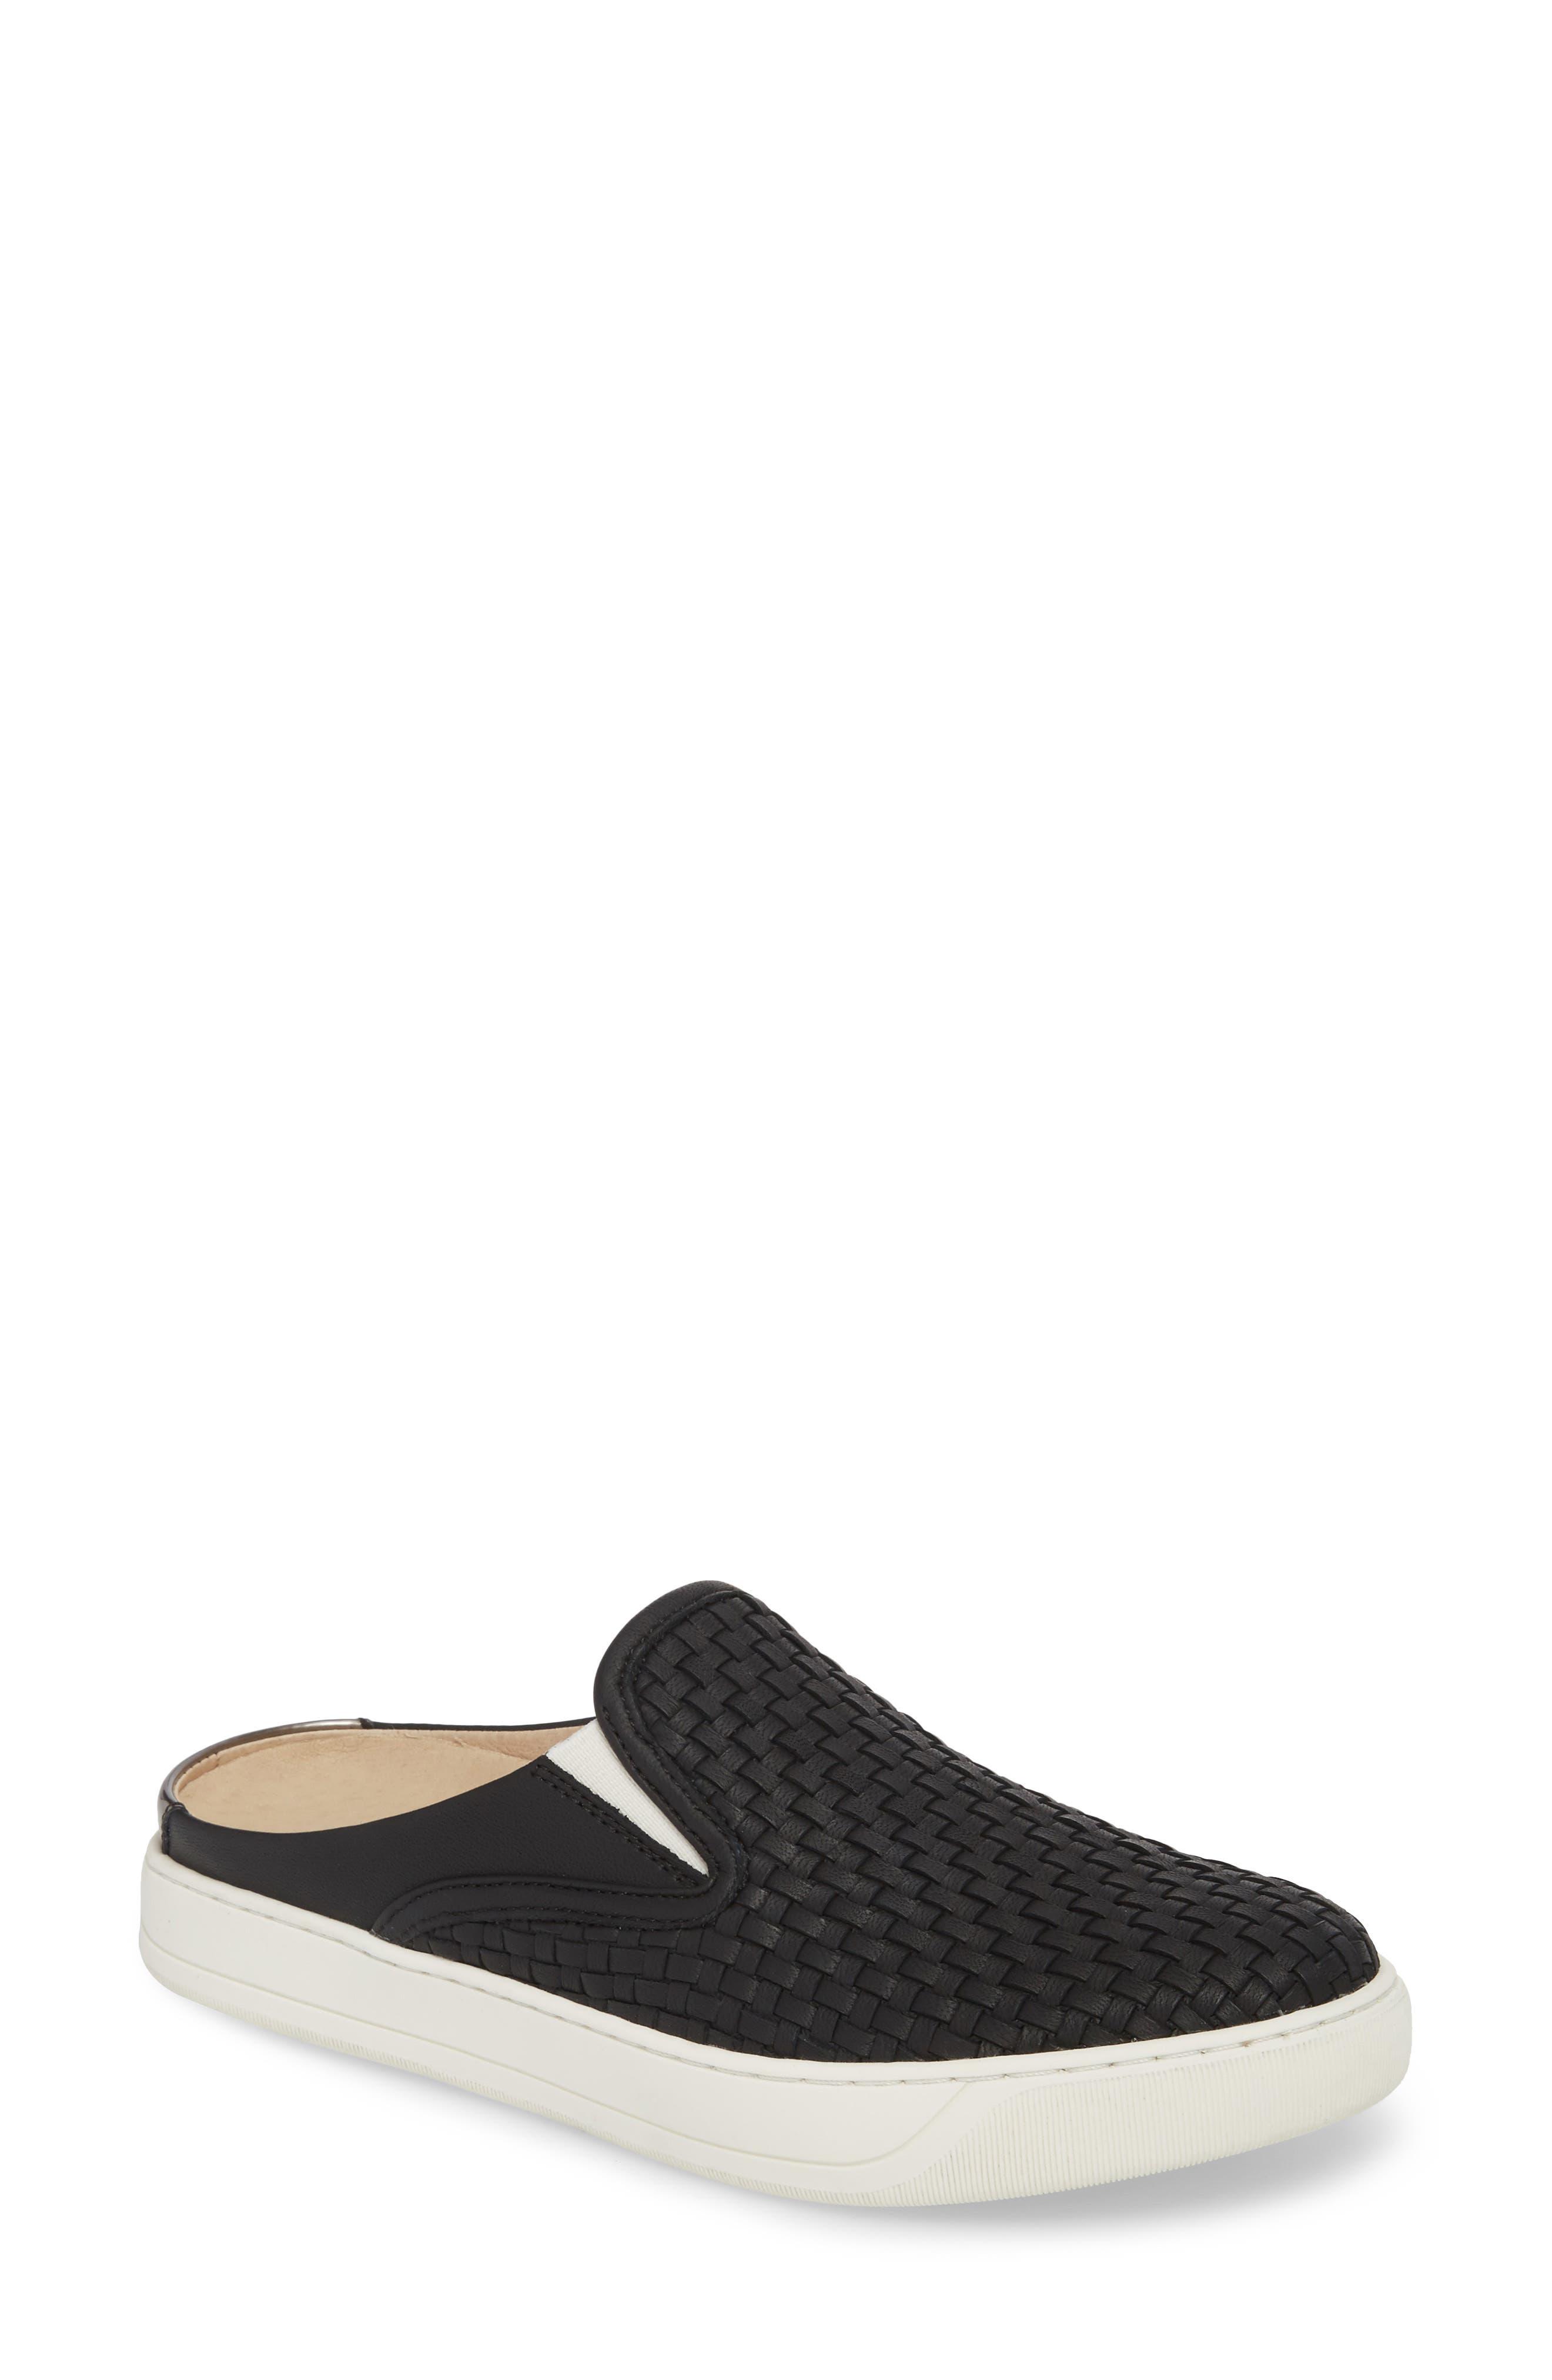 JOHNSTON & MURPHY Evie Slip-On Sneaker, Main, color, BLACK LEATHER